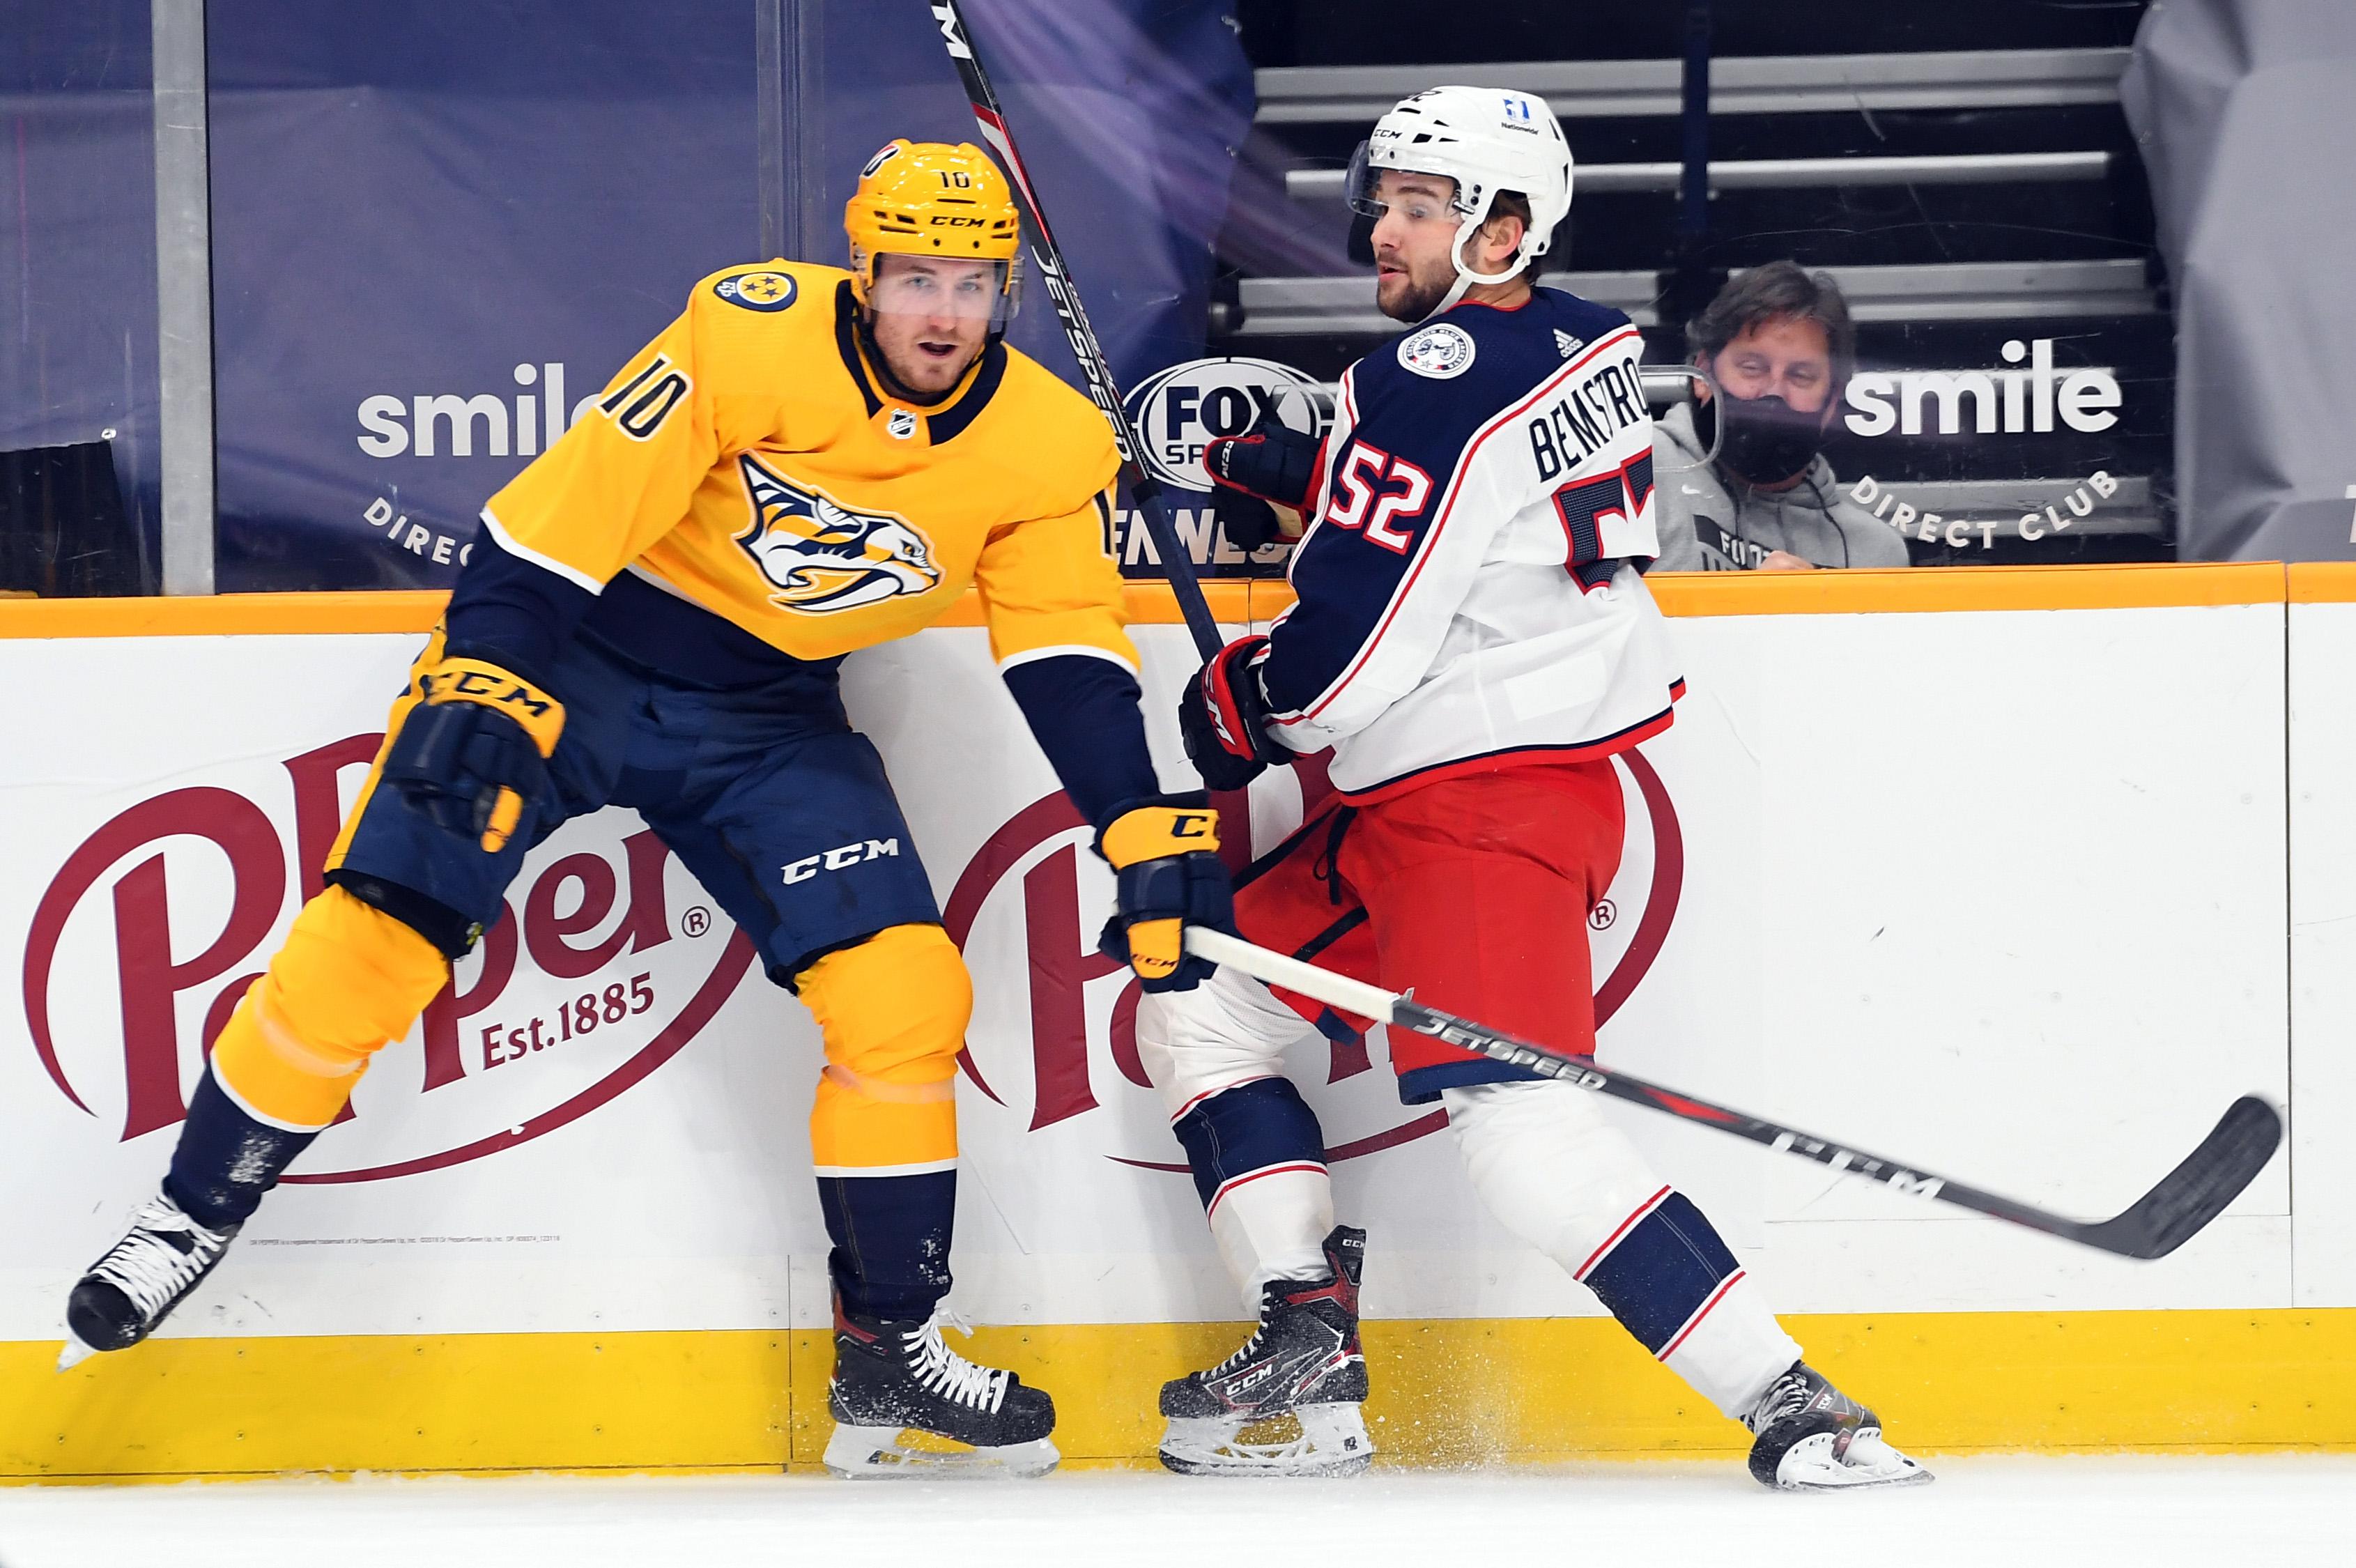 NHL: Columbus Blue Jackets at Nashville Predators